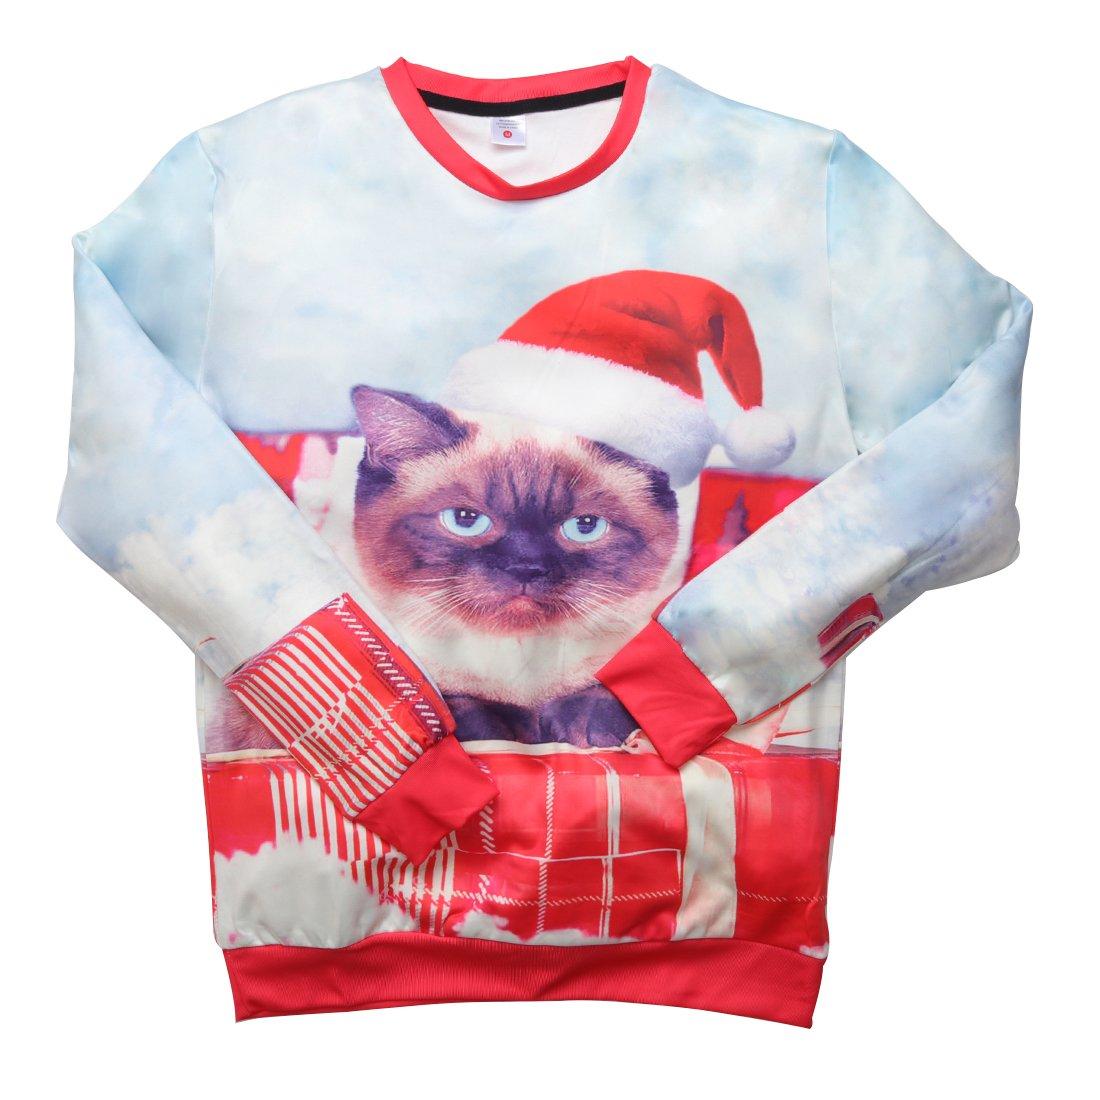 543a7b04e9088a Uideazone Men Women Ugly Christmas Pullover Sweatshirts 3D Digital ...